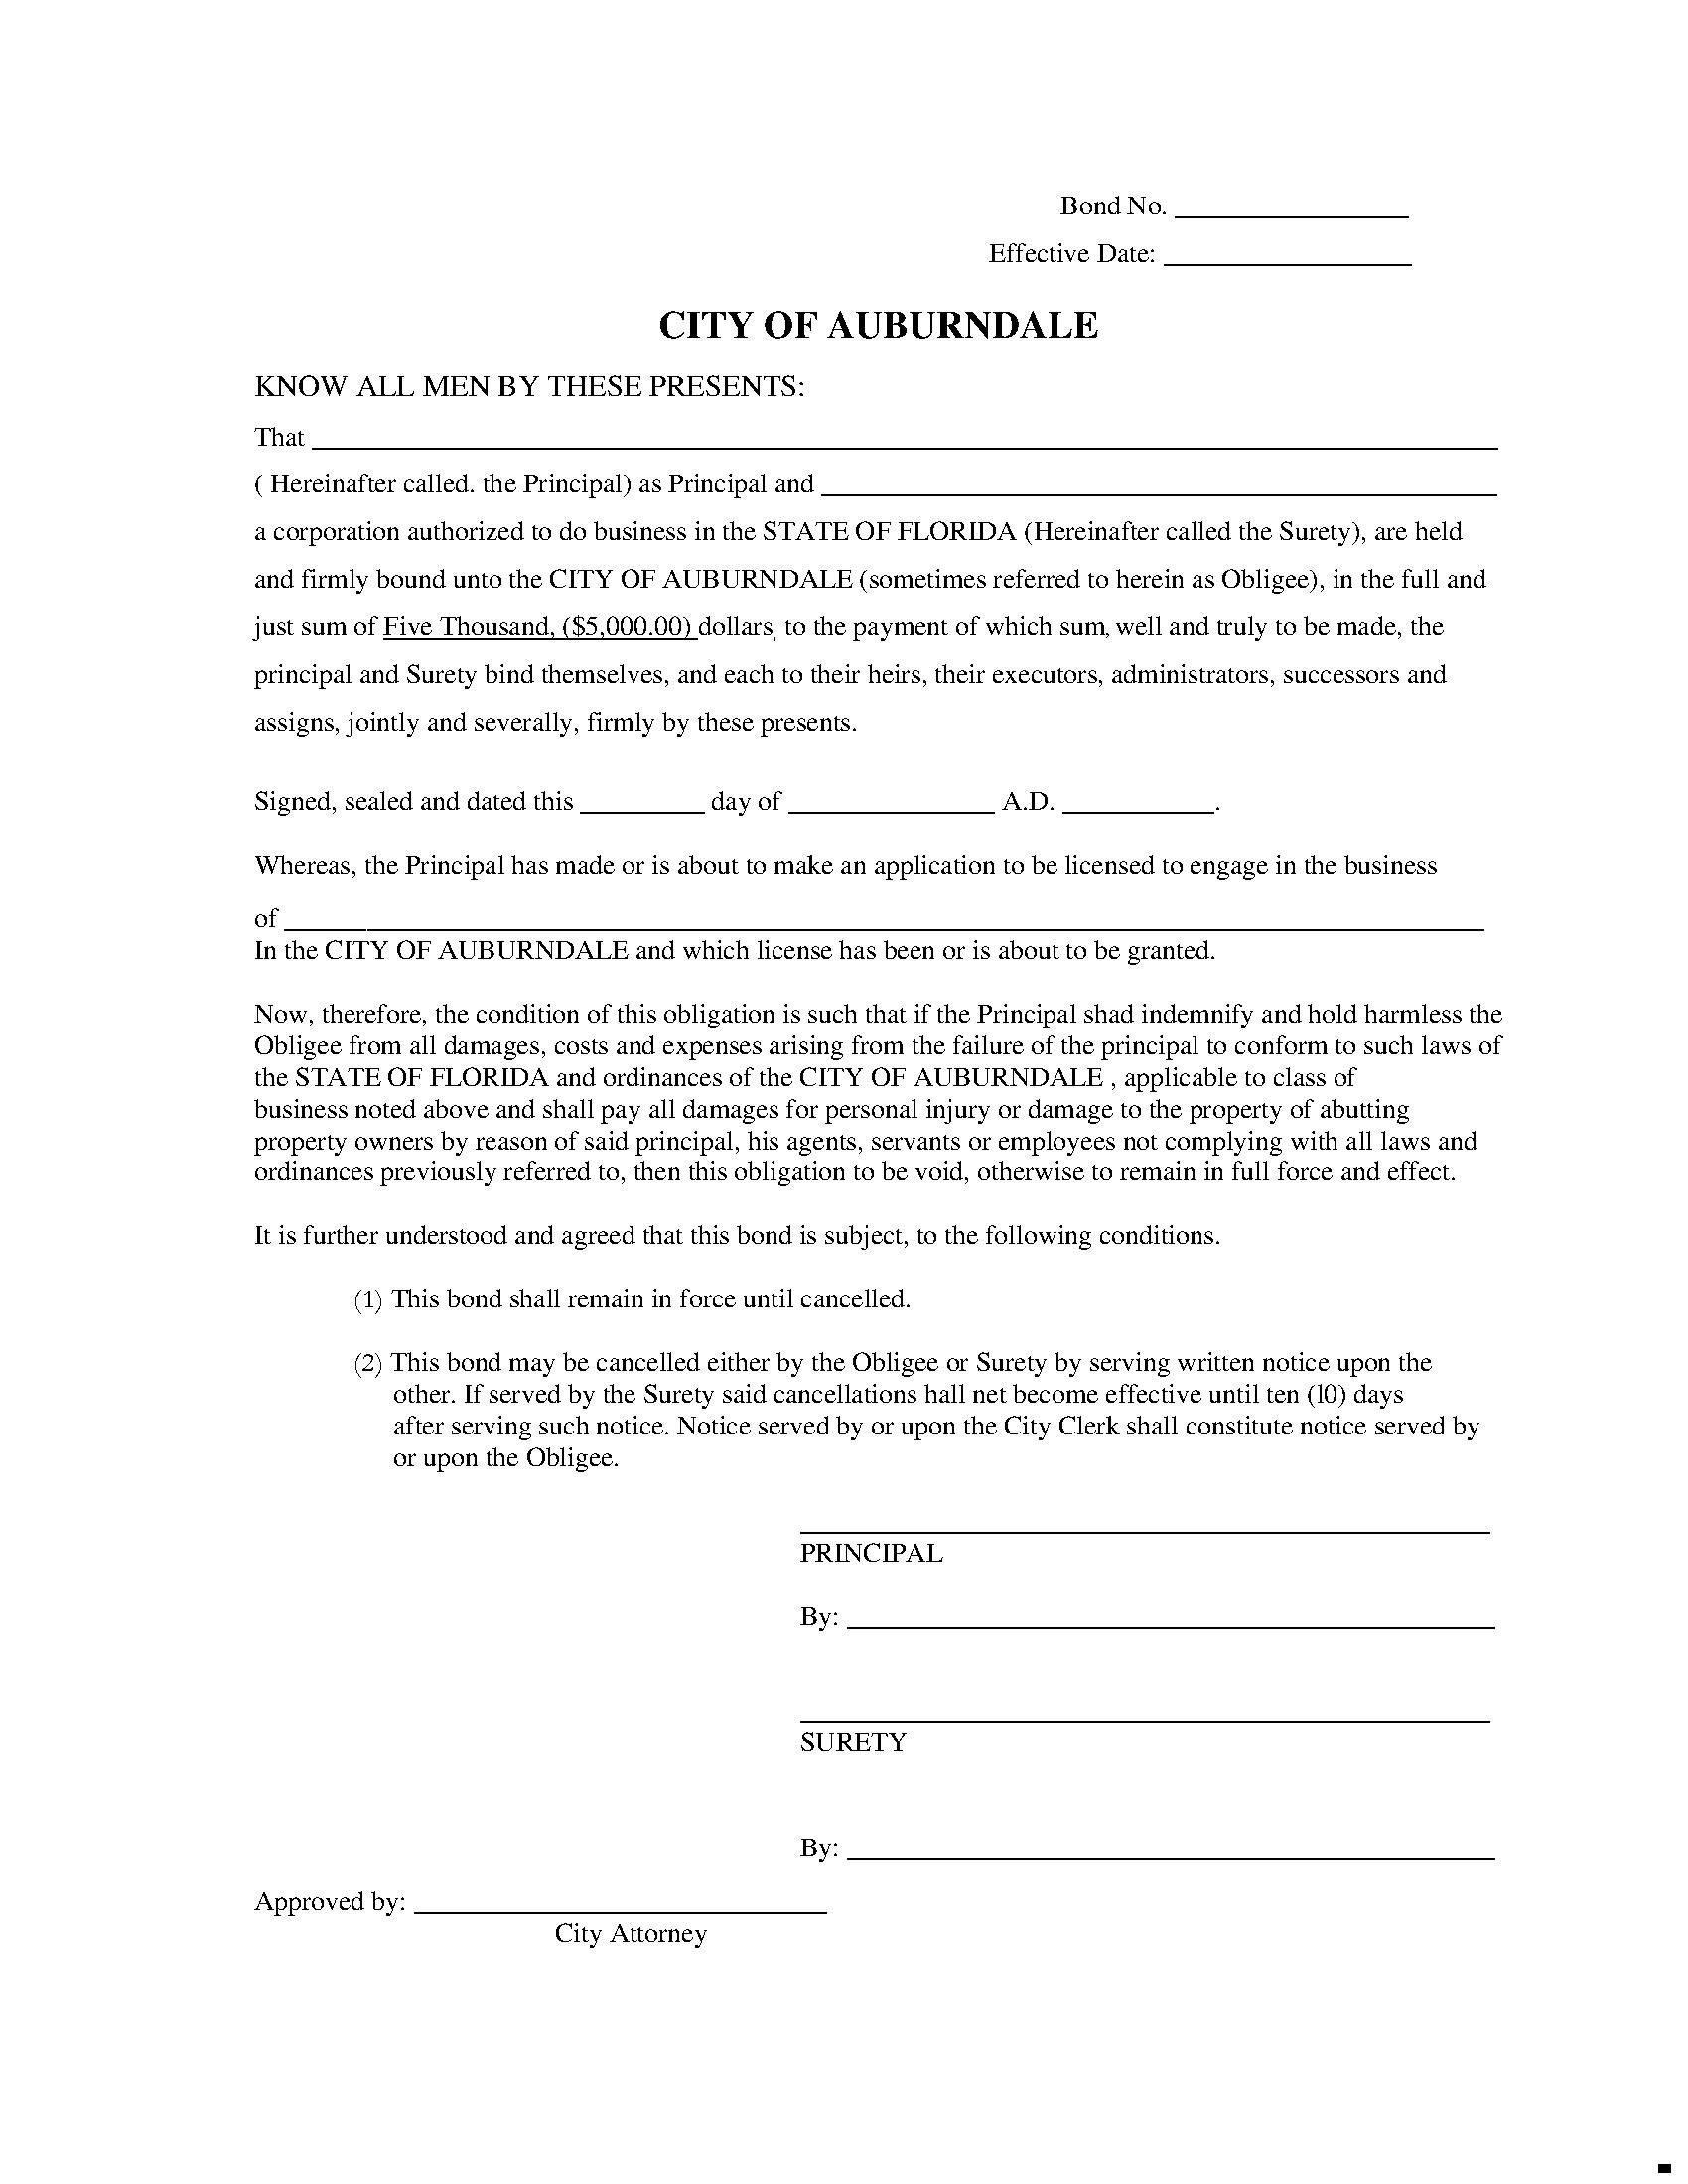 City of Auburndale Auburndale - City License/Permit sample image